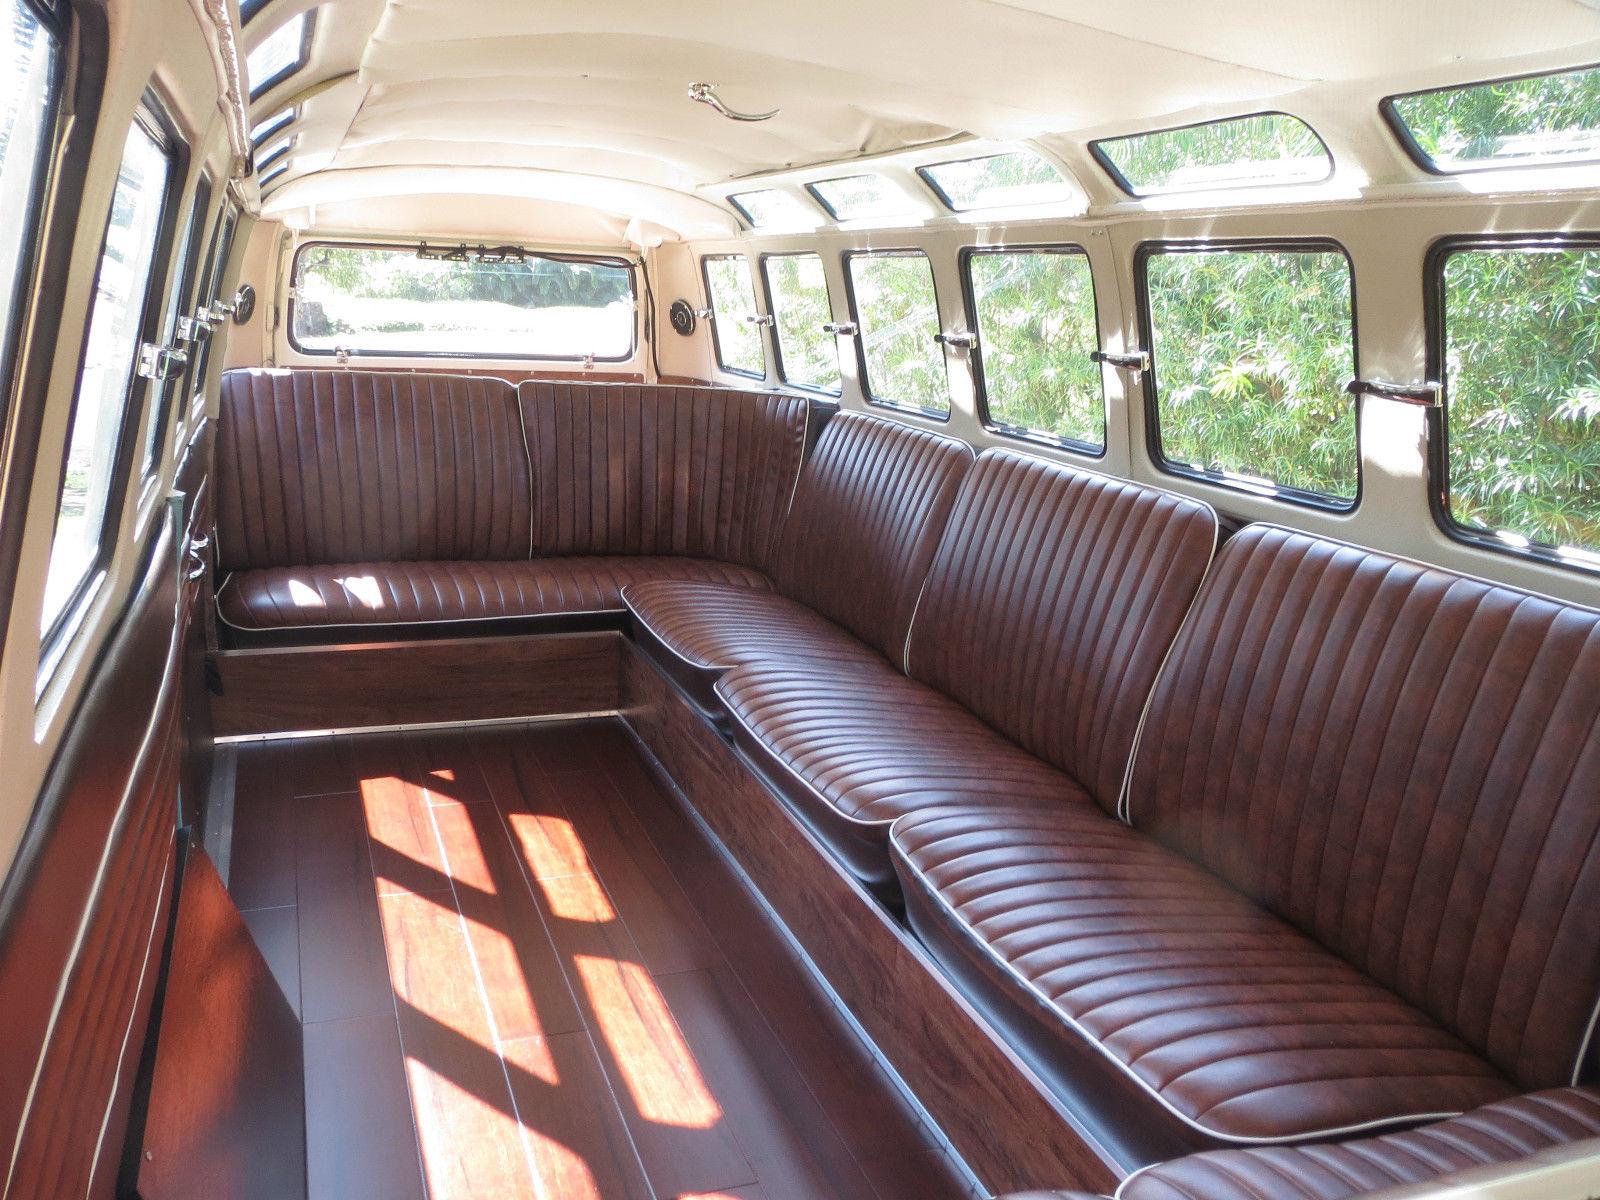 Vw Microbus For Sale >> BangShift.com 33 WINDOW VW BUS